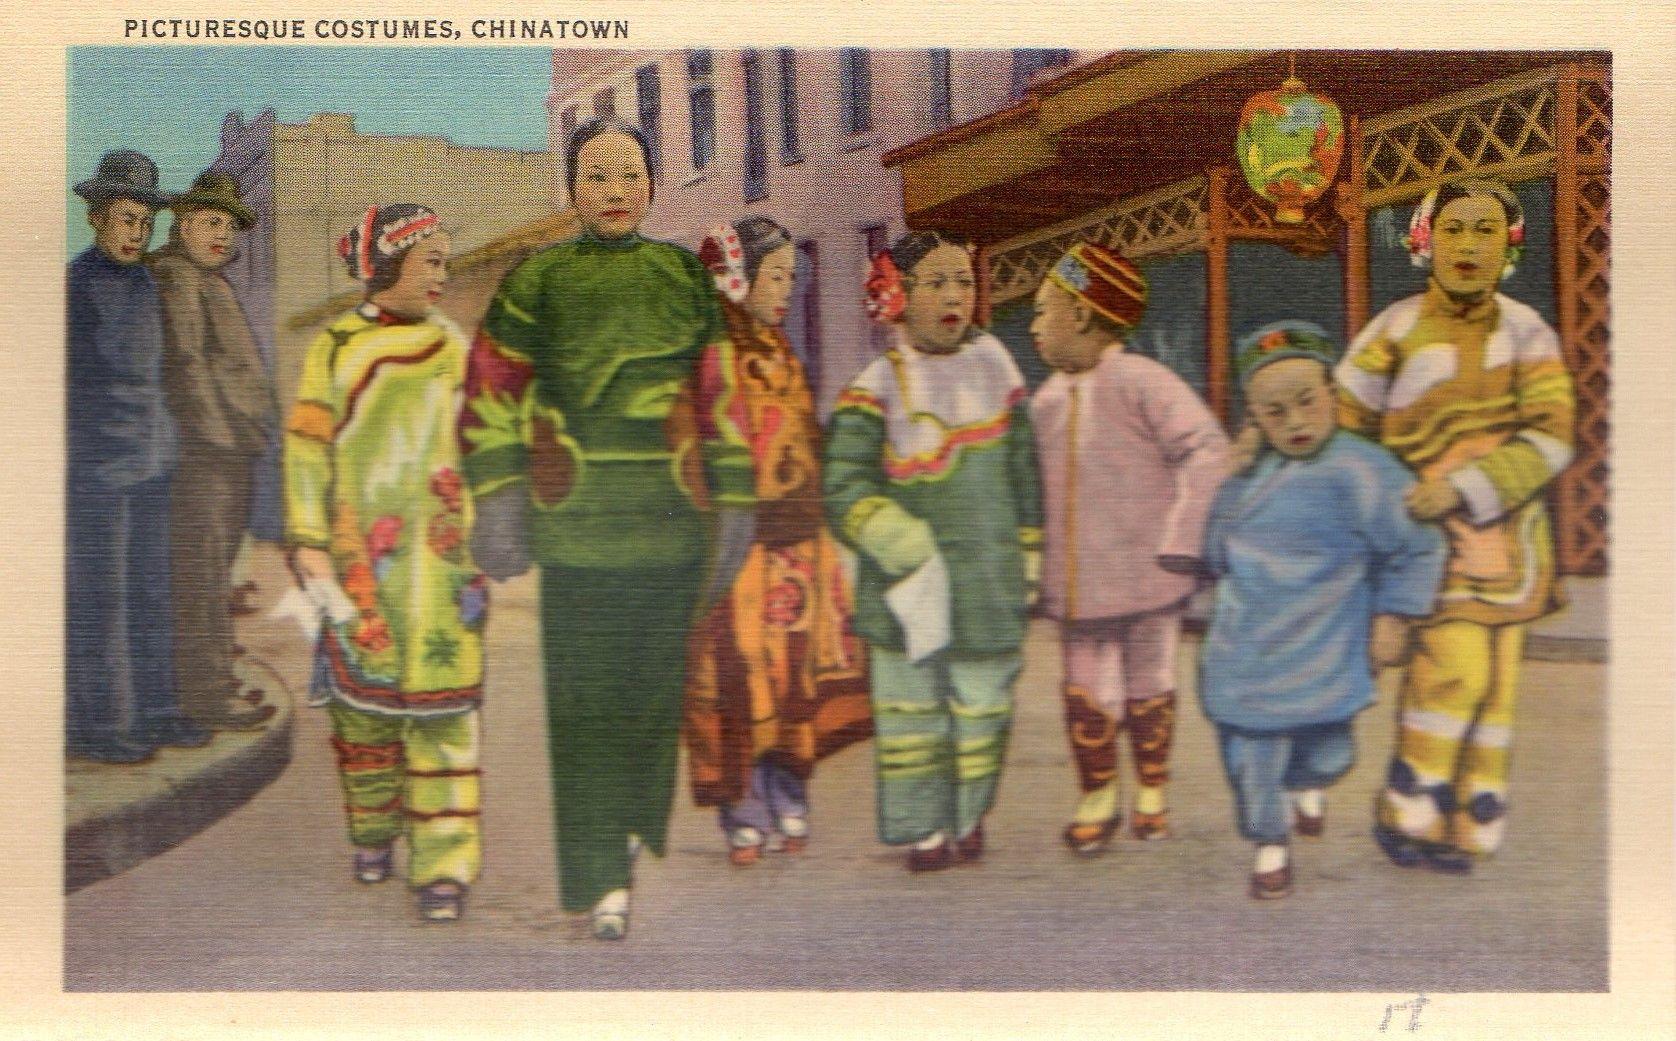 Vintage Postcard shows Picturesque Costumes Chinatown San